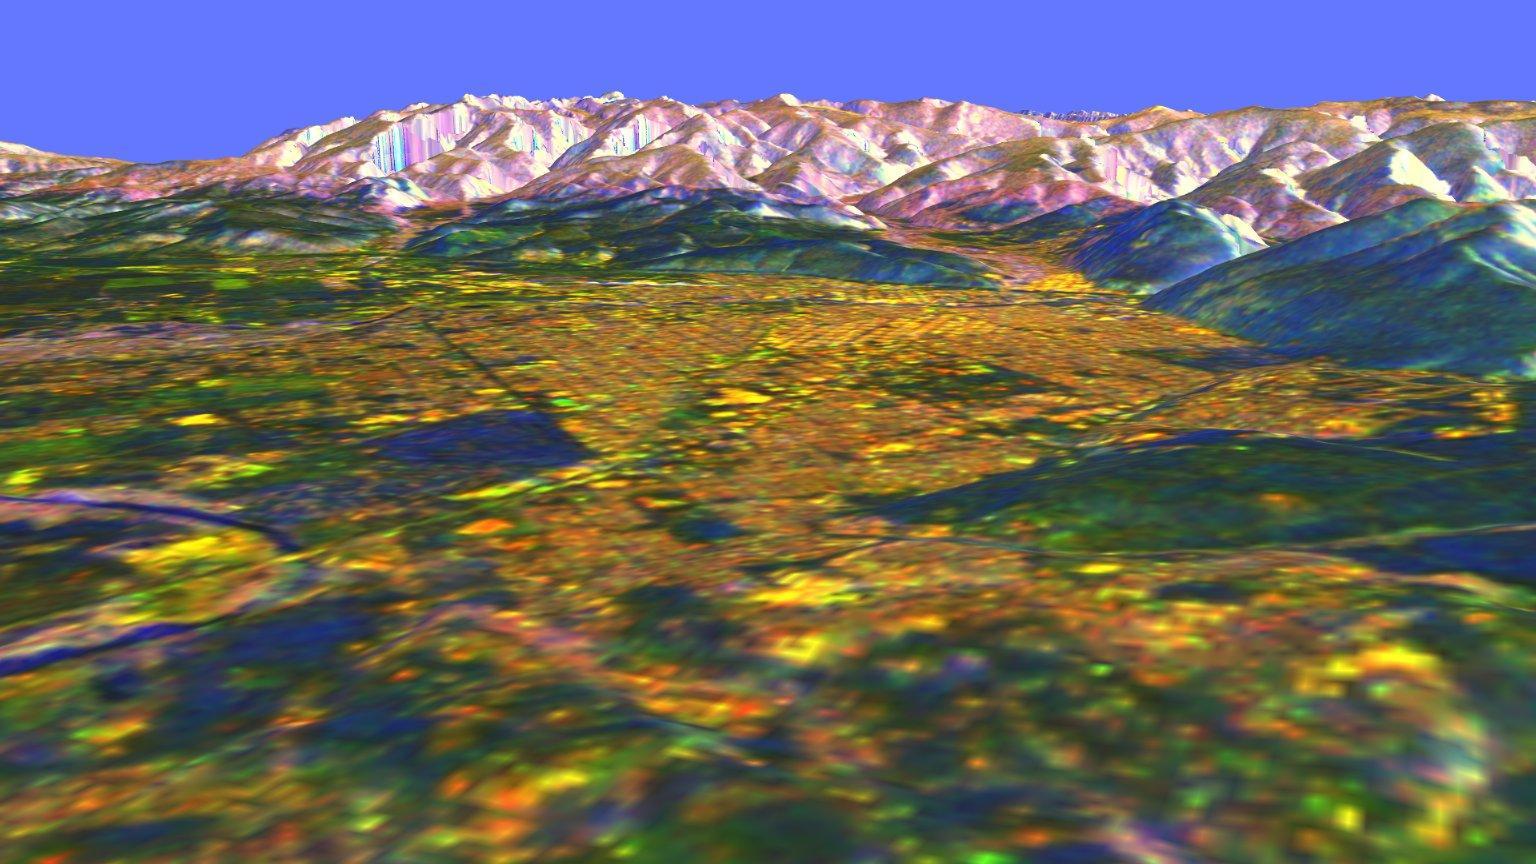 Missoula, Montana 3-D perspective view L & C bands